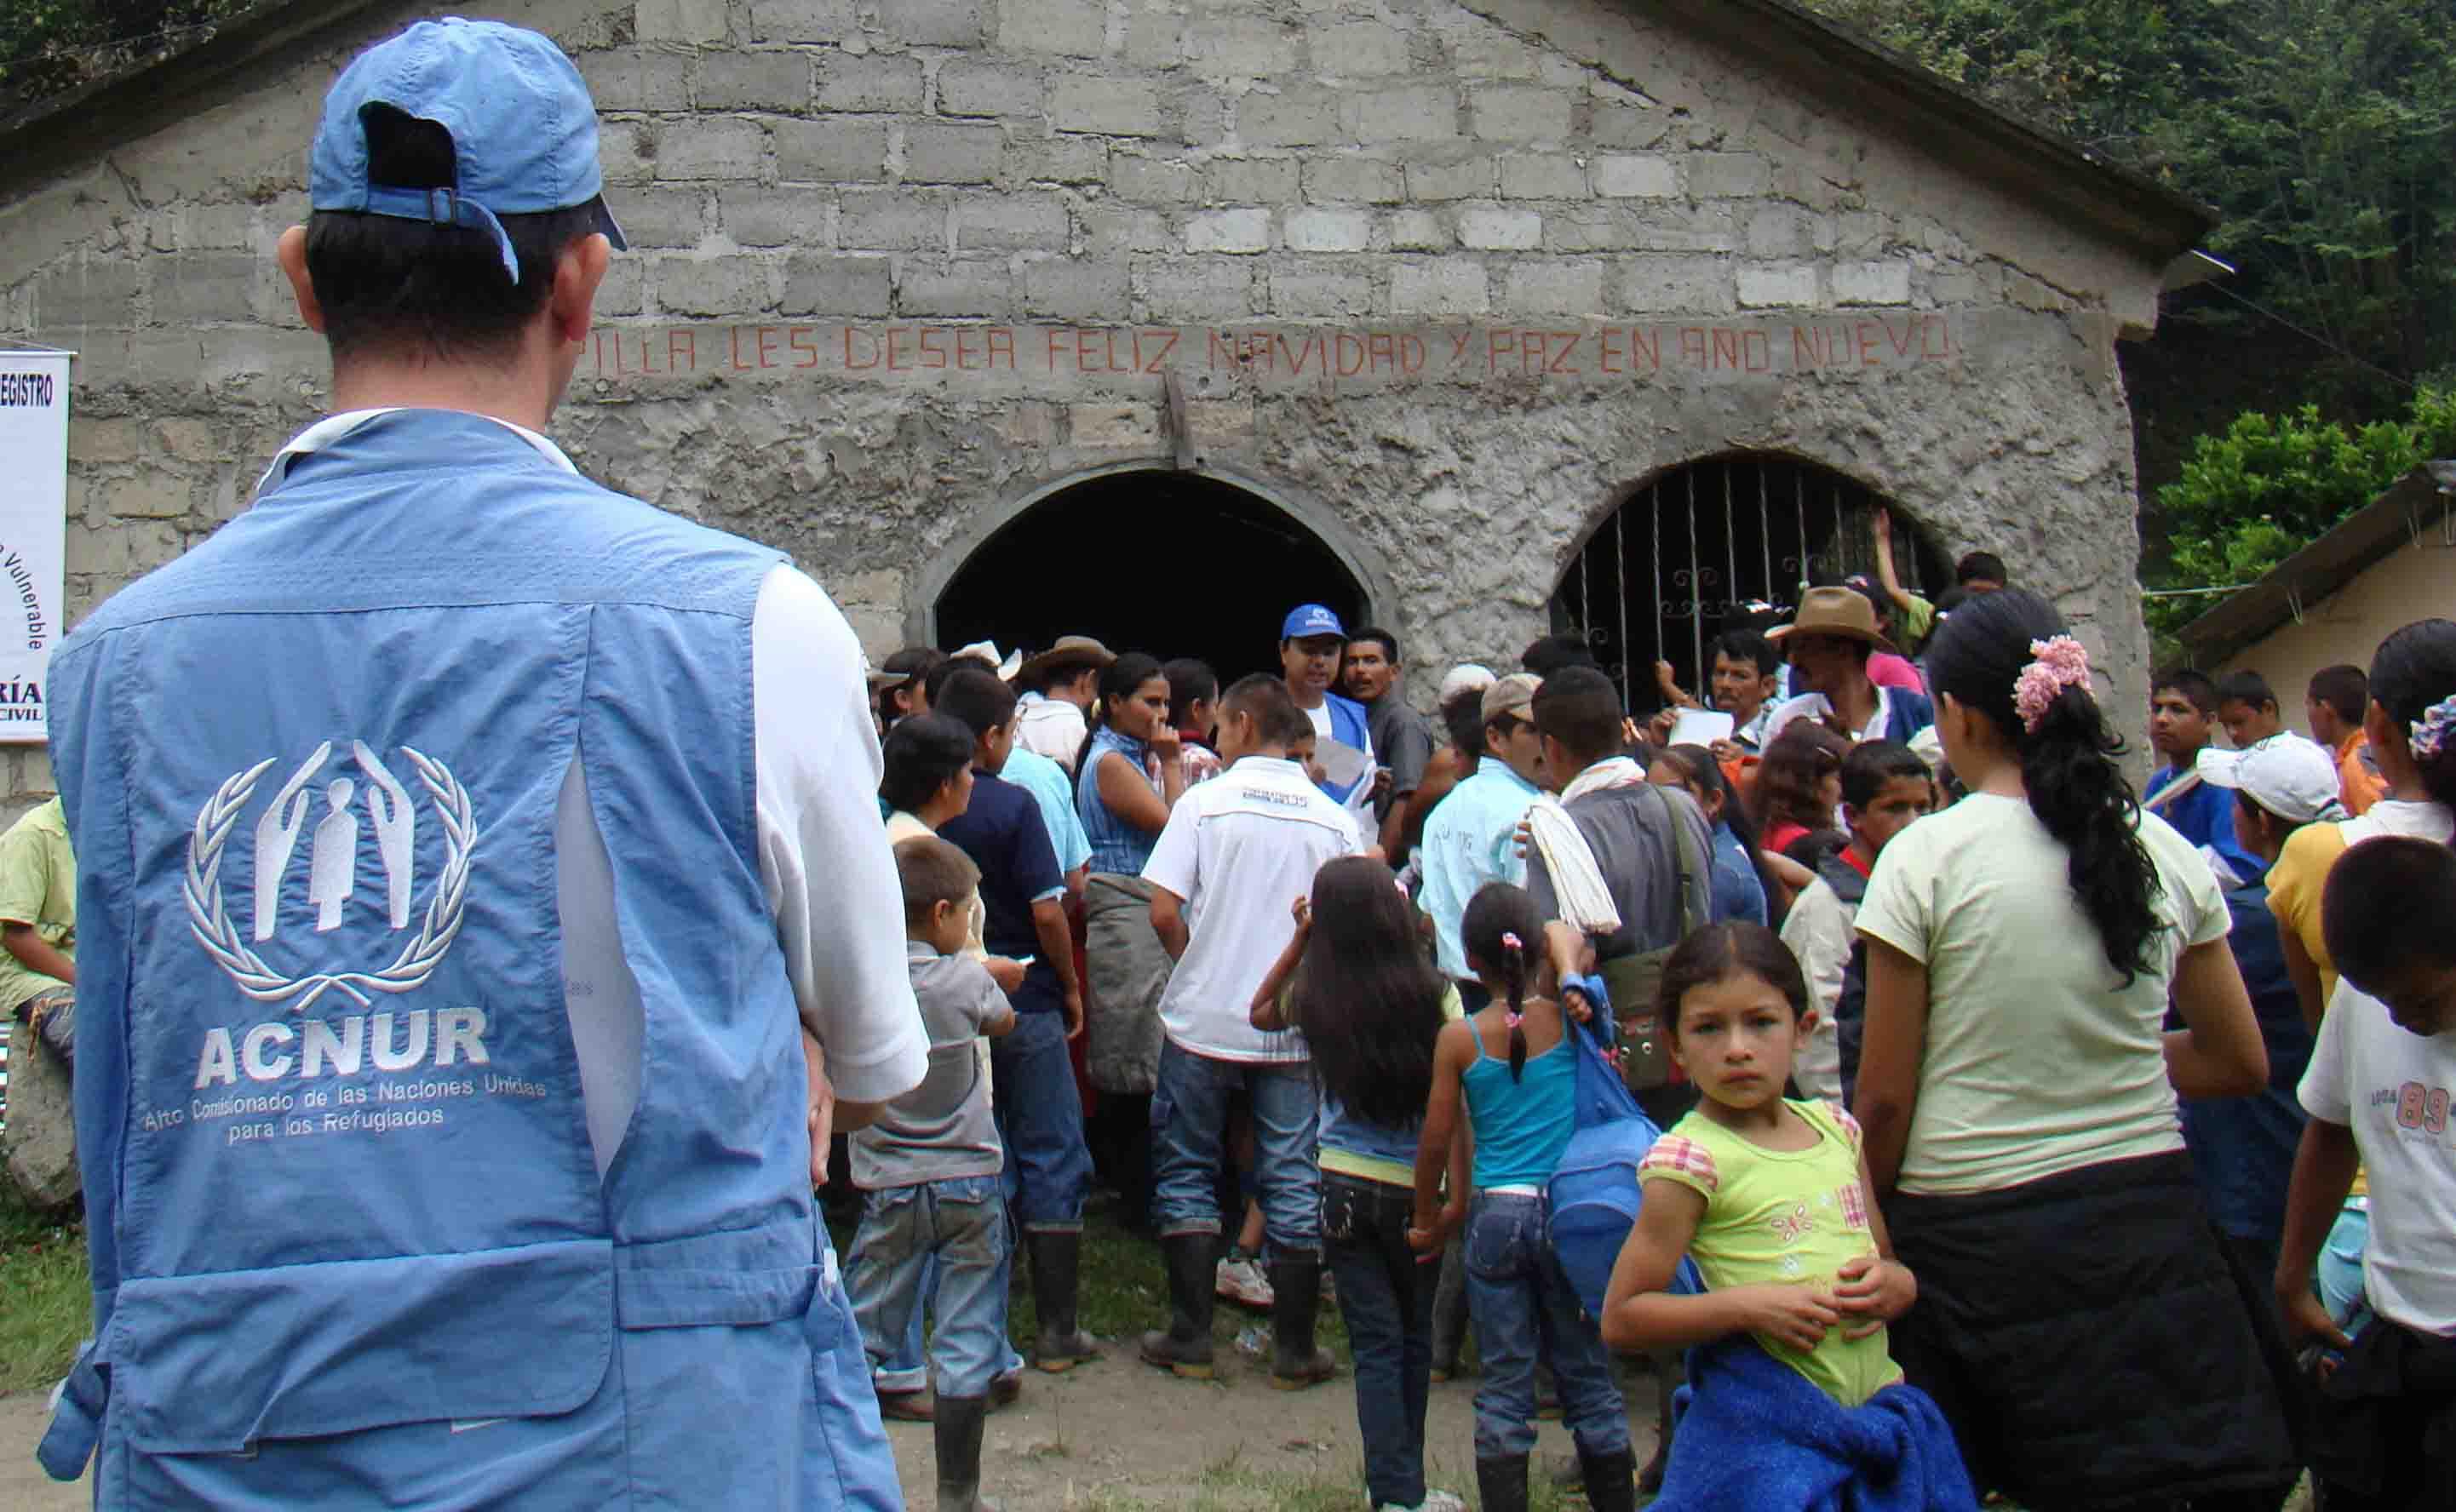 M. Verney, SO Cúcuta, Norte de Santander, Catatumbo, Colombia